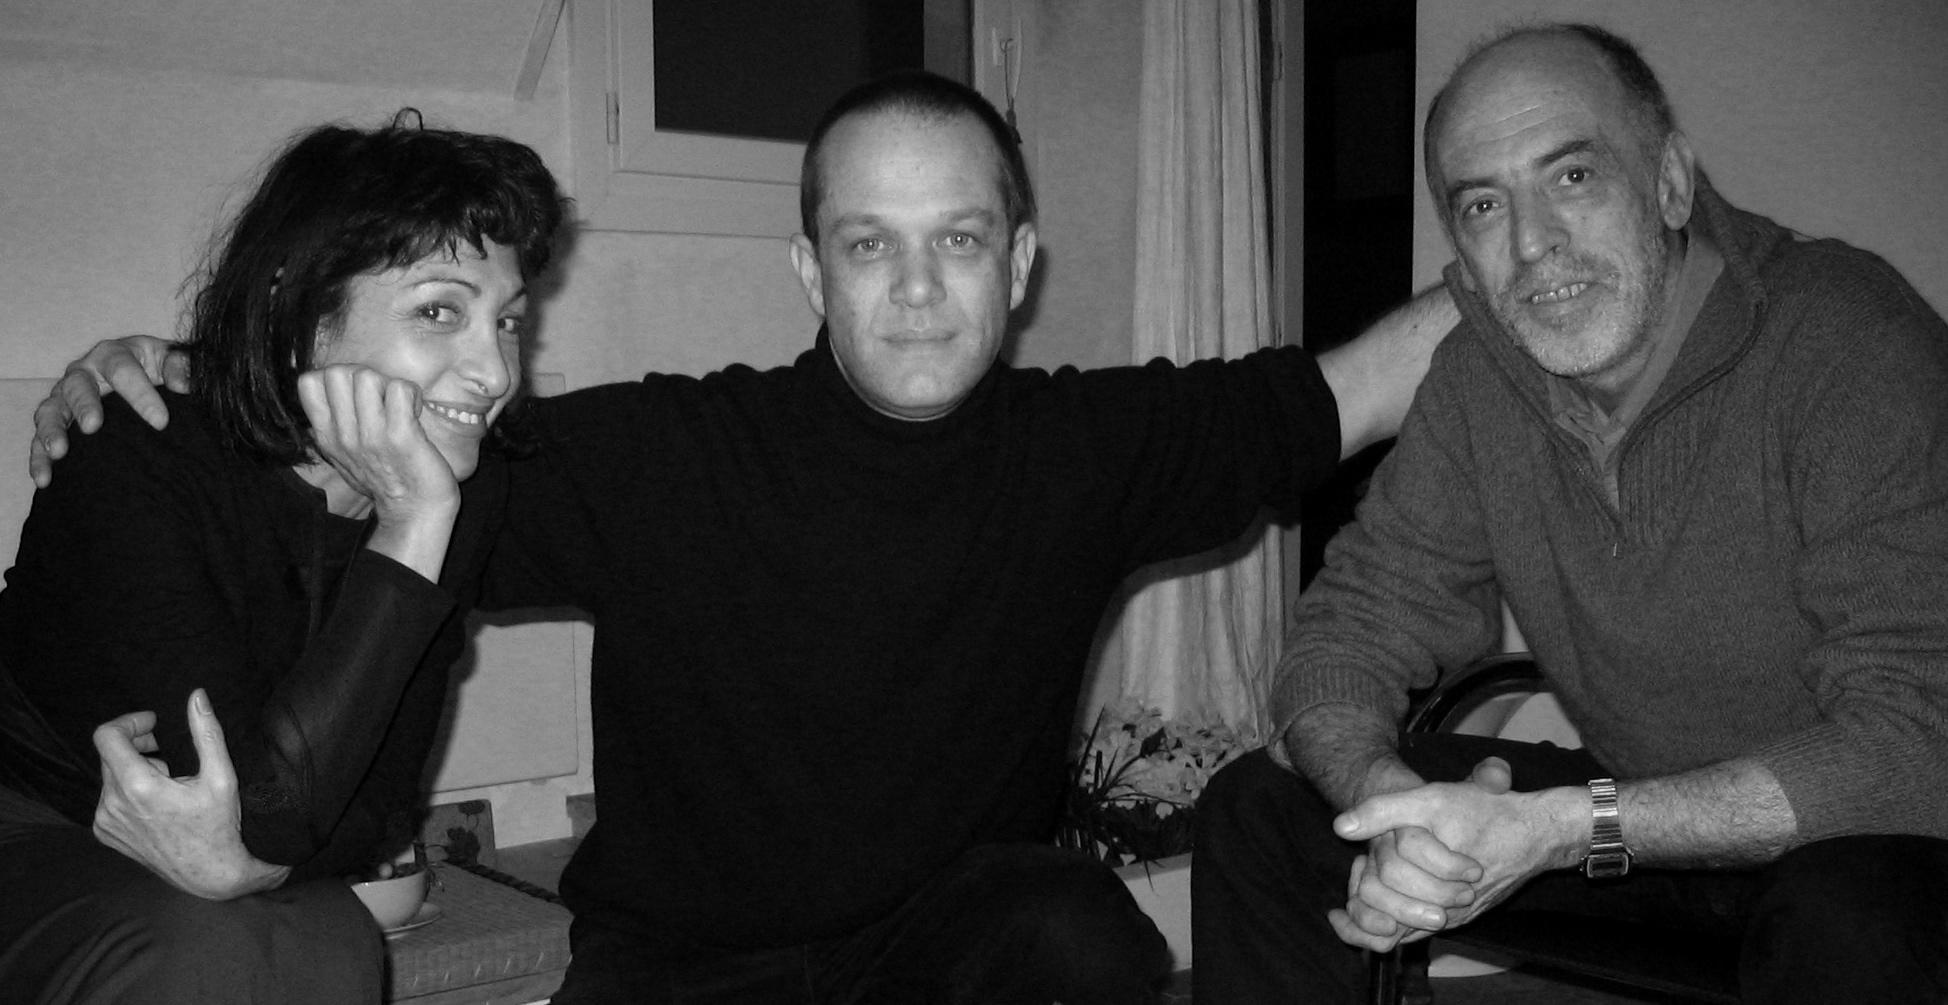 With Eve Couturier (EC#) and Palix. Paris, 2005